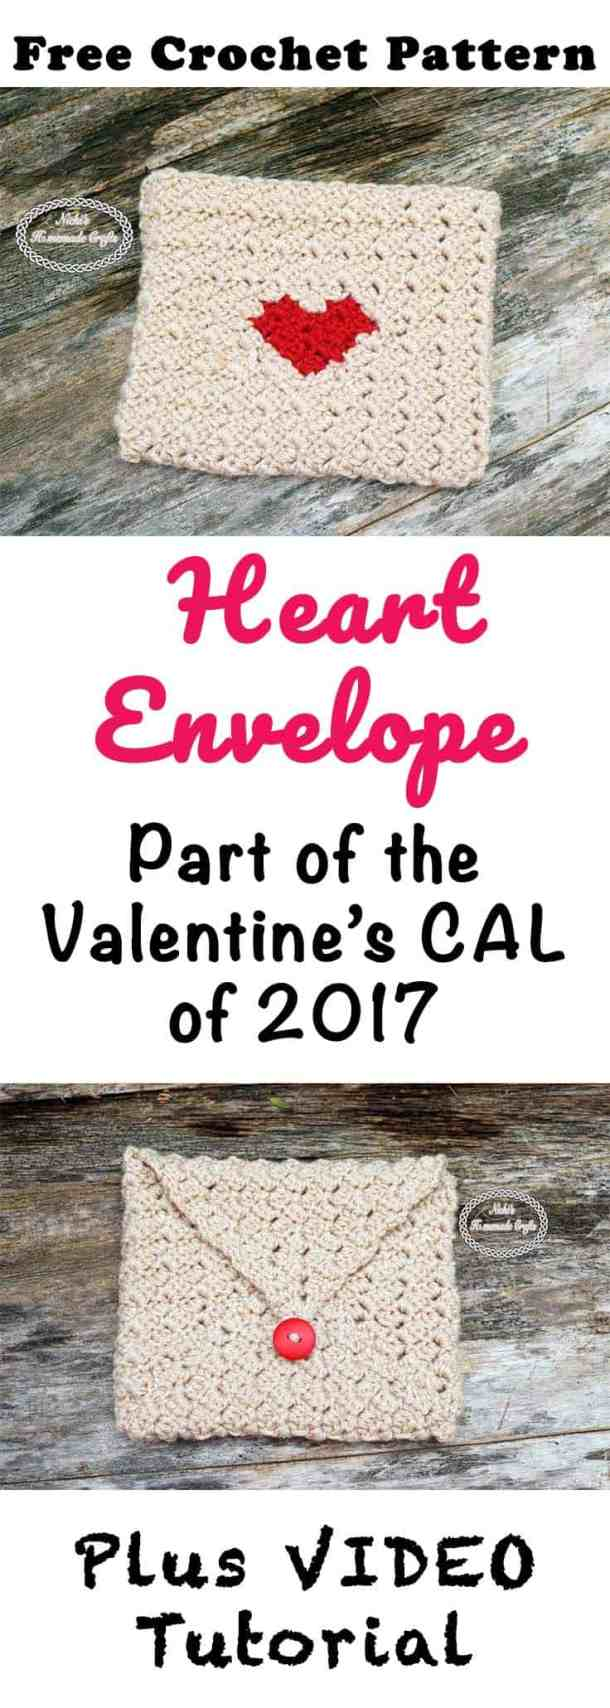 Heart Envelope of Valentine's CAL 2017 Free Crochet Pattern by Nicki's Homemade Crafts #crochet #heart #valentinesday #envelope #cornertocorner